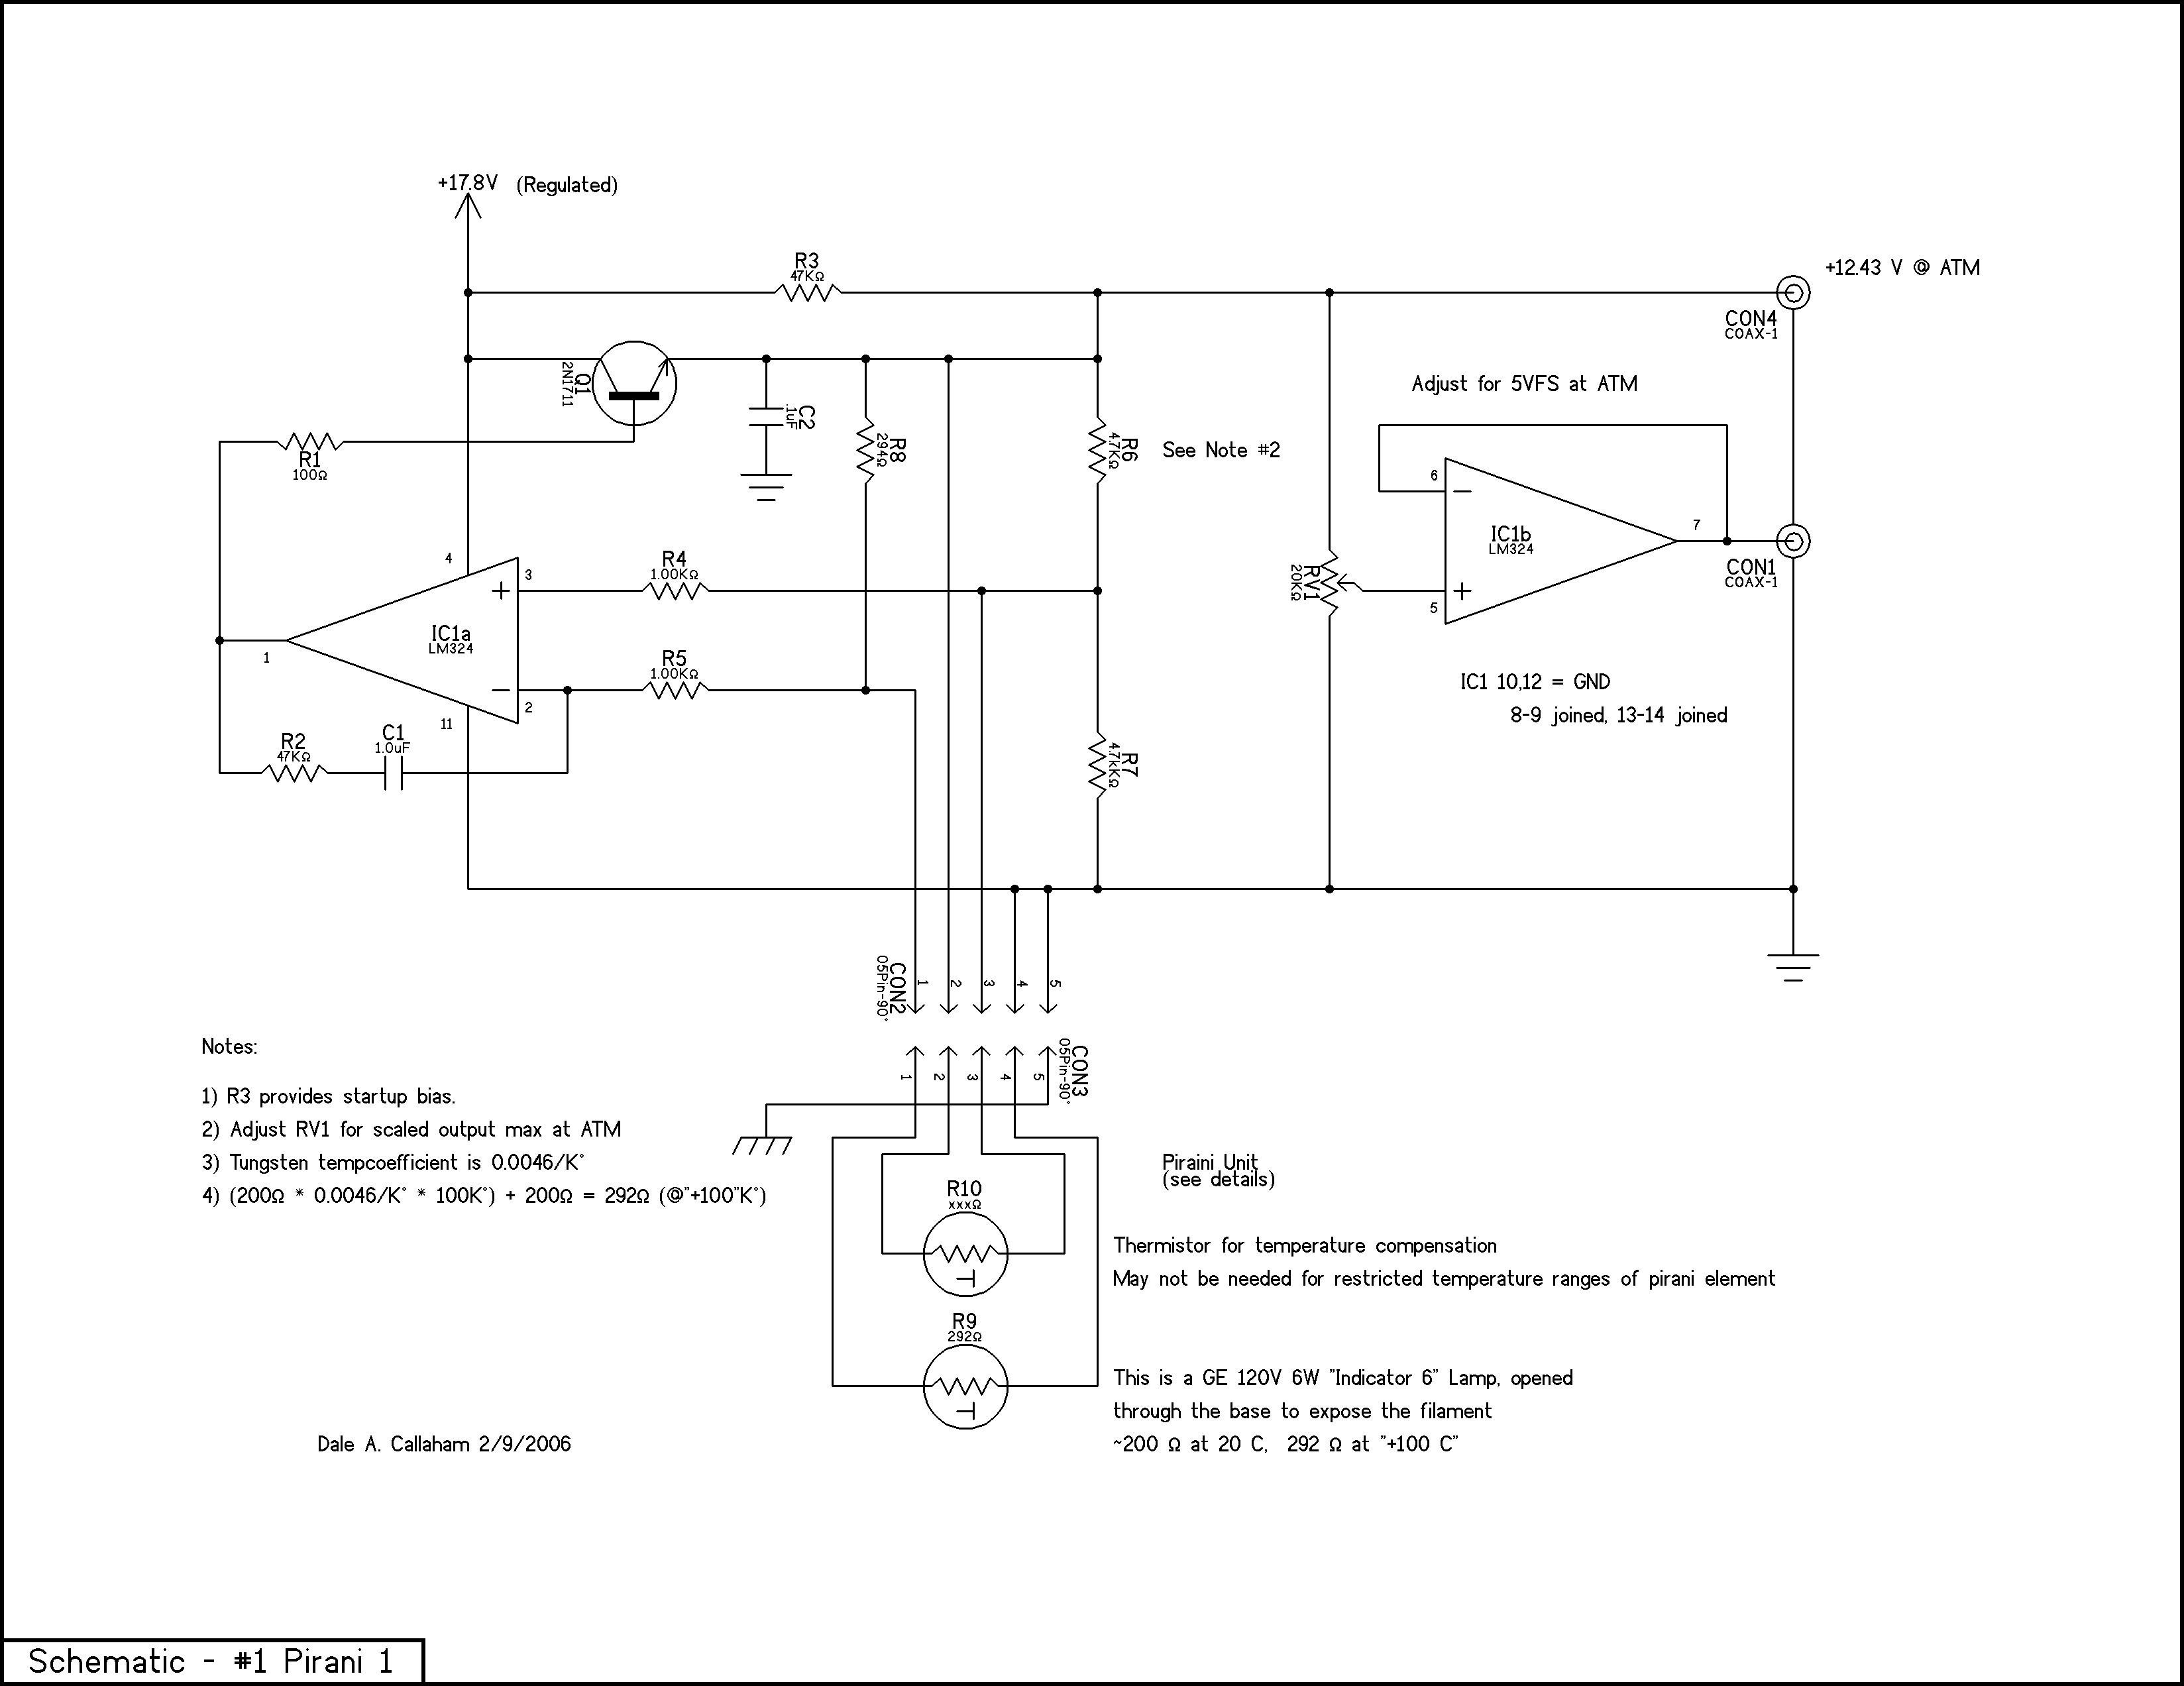 house wiring diagram electrical floor plan 2004 2010 bmw x3 e83 3 0d rh magnusrosen net